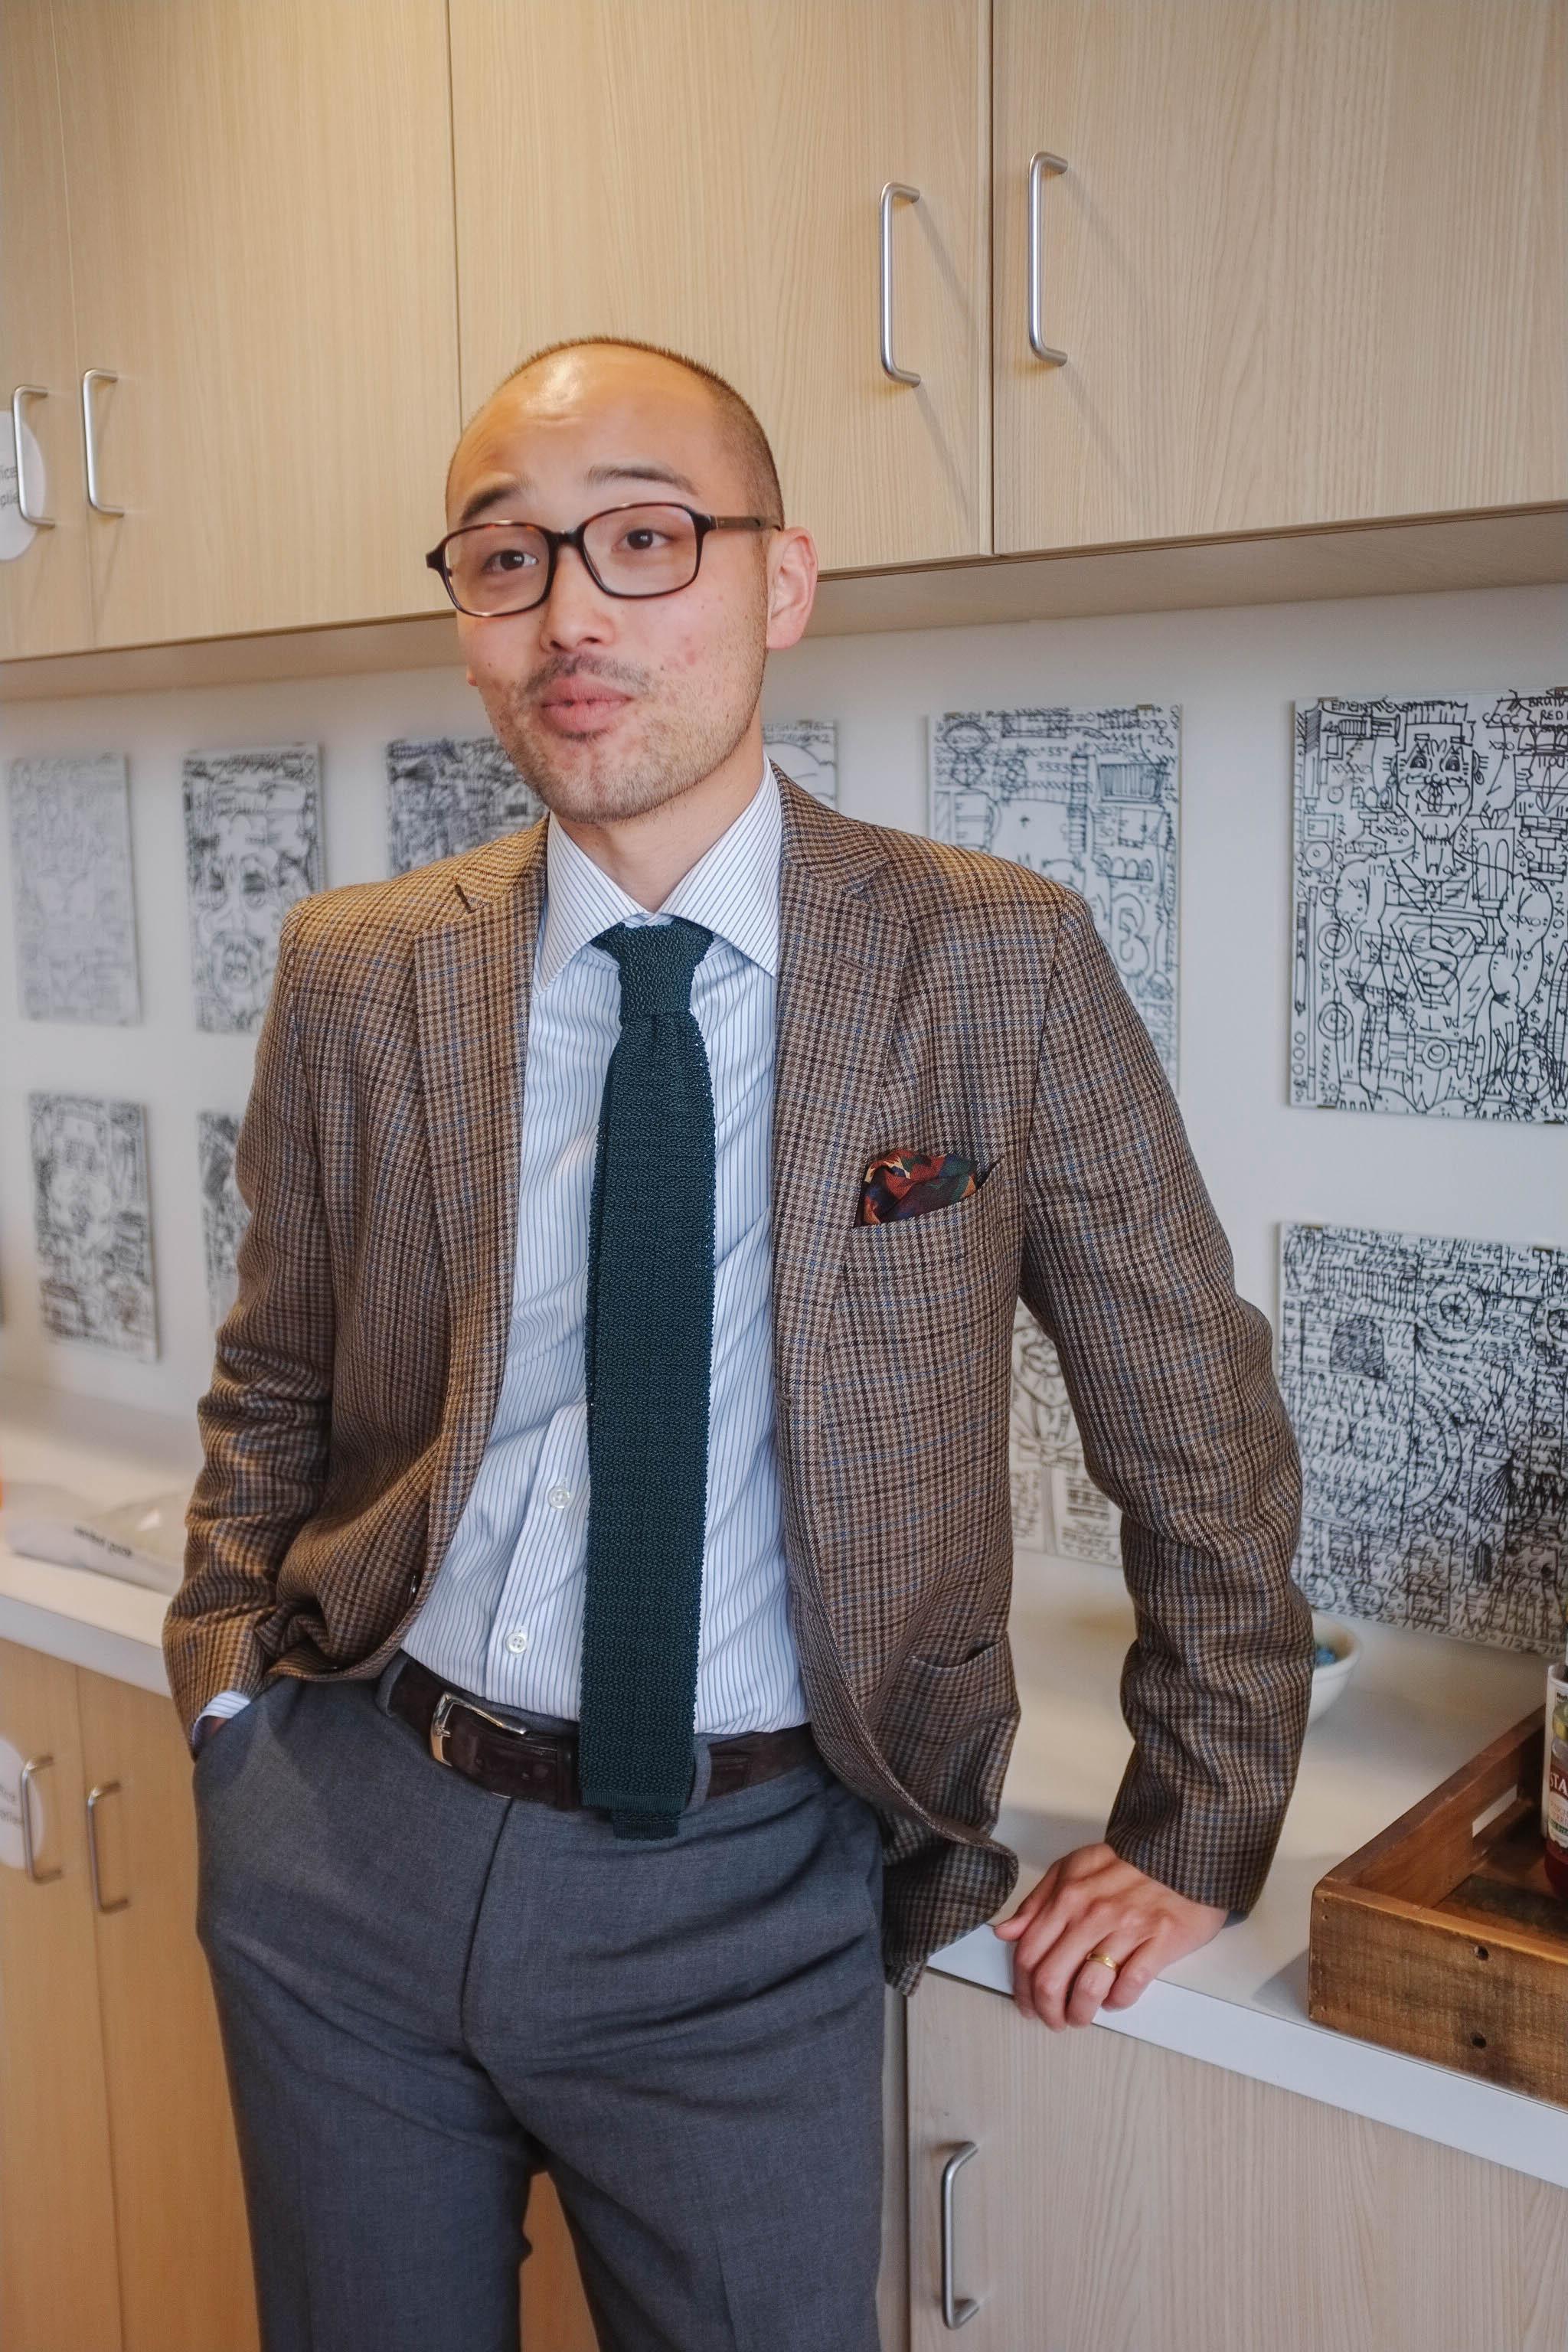 Glasses -   JINS   Sports coat - Epaulet   Shirt - Proper Cloth   Tie and Pocket Square - Drake's of London   Belt - Carmina Shoemaker   Trousers - Epaulet